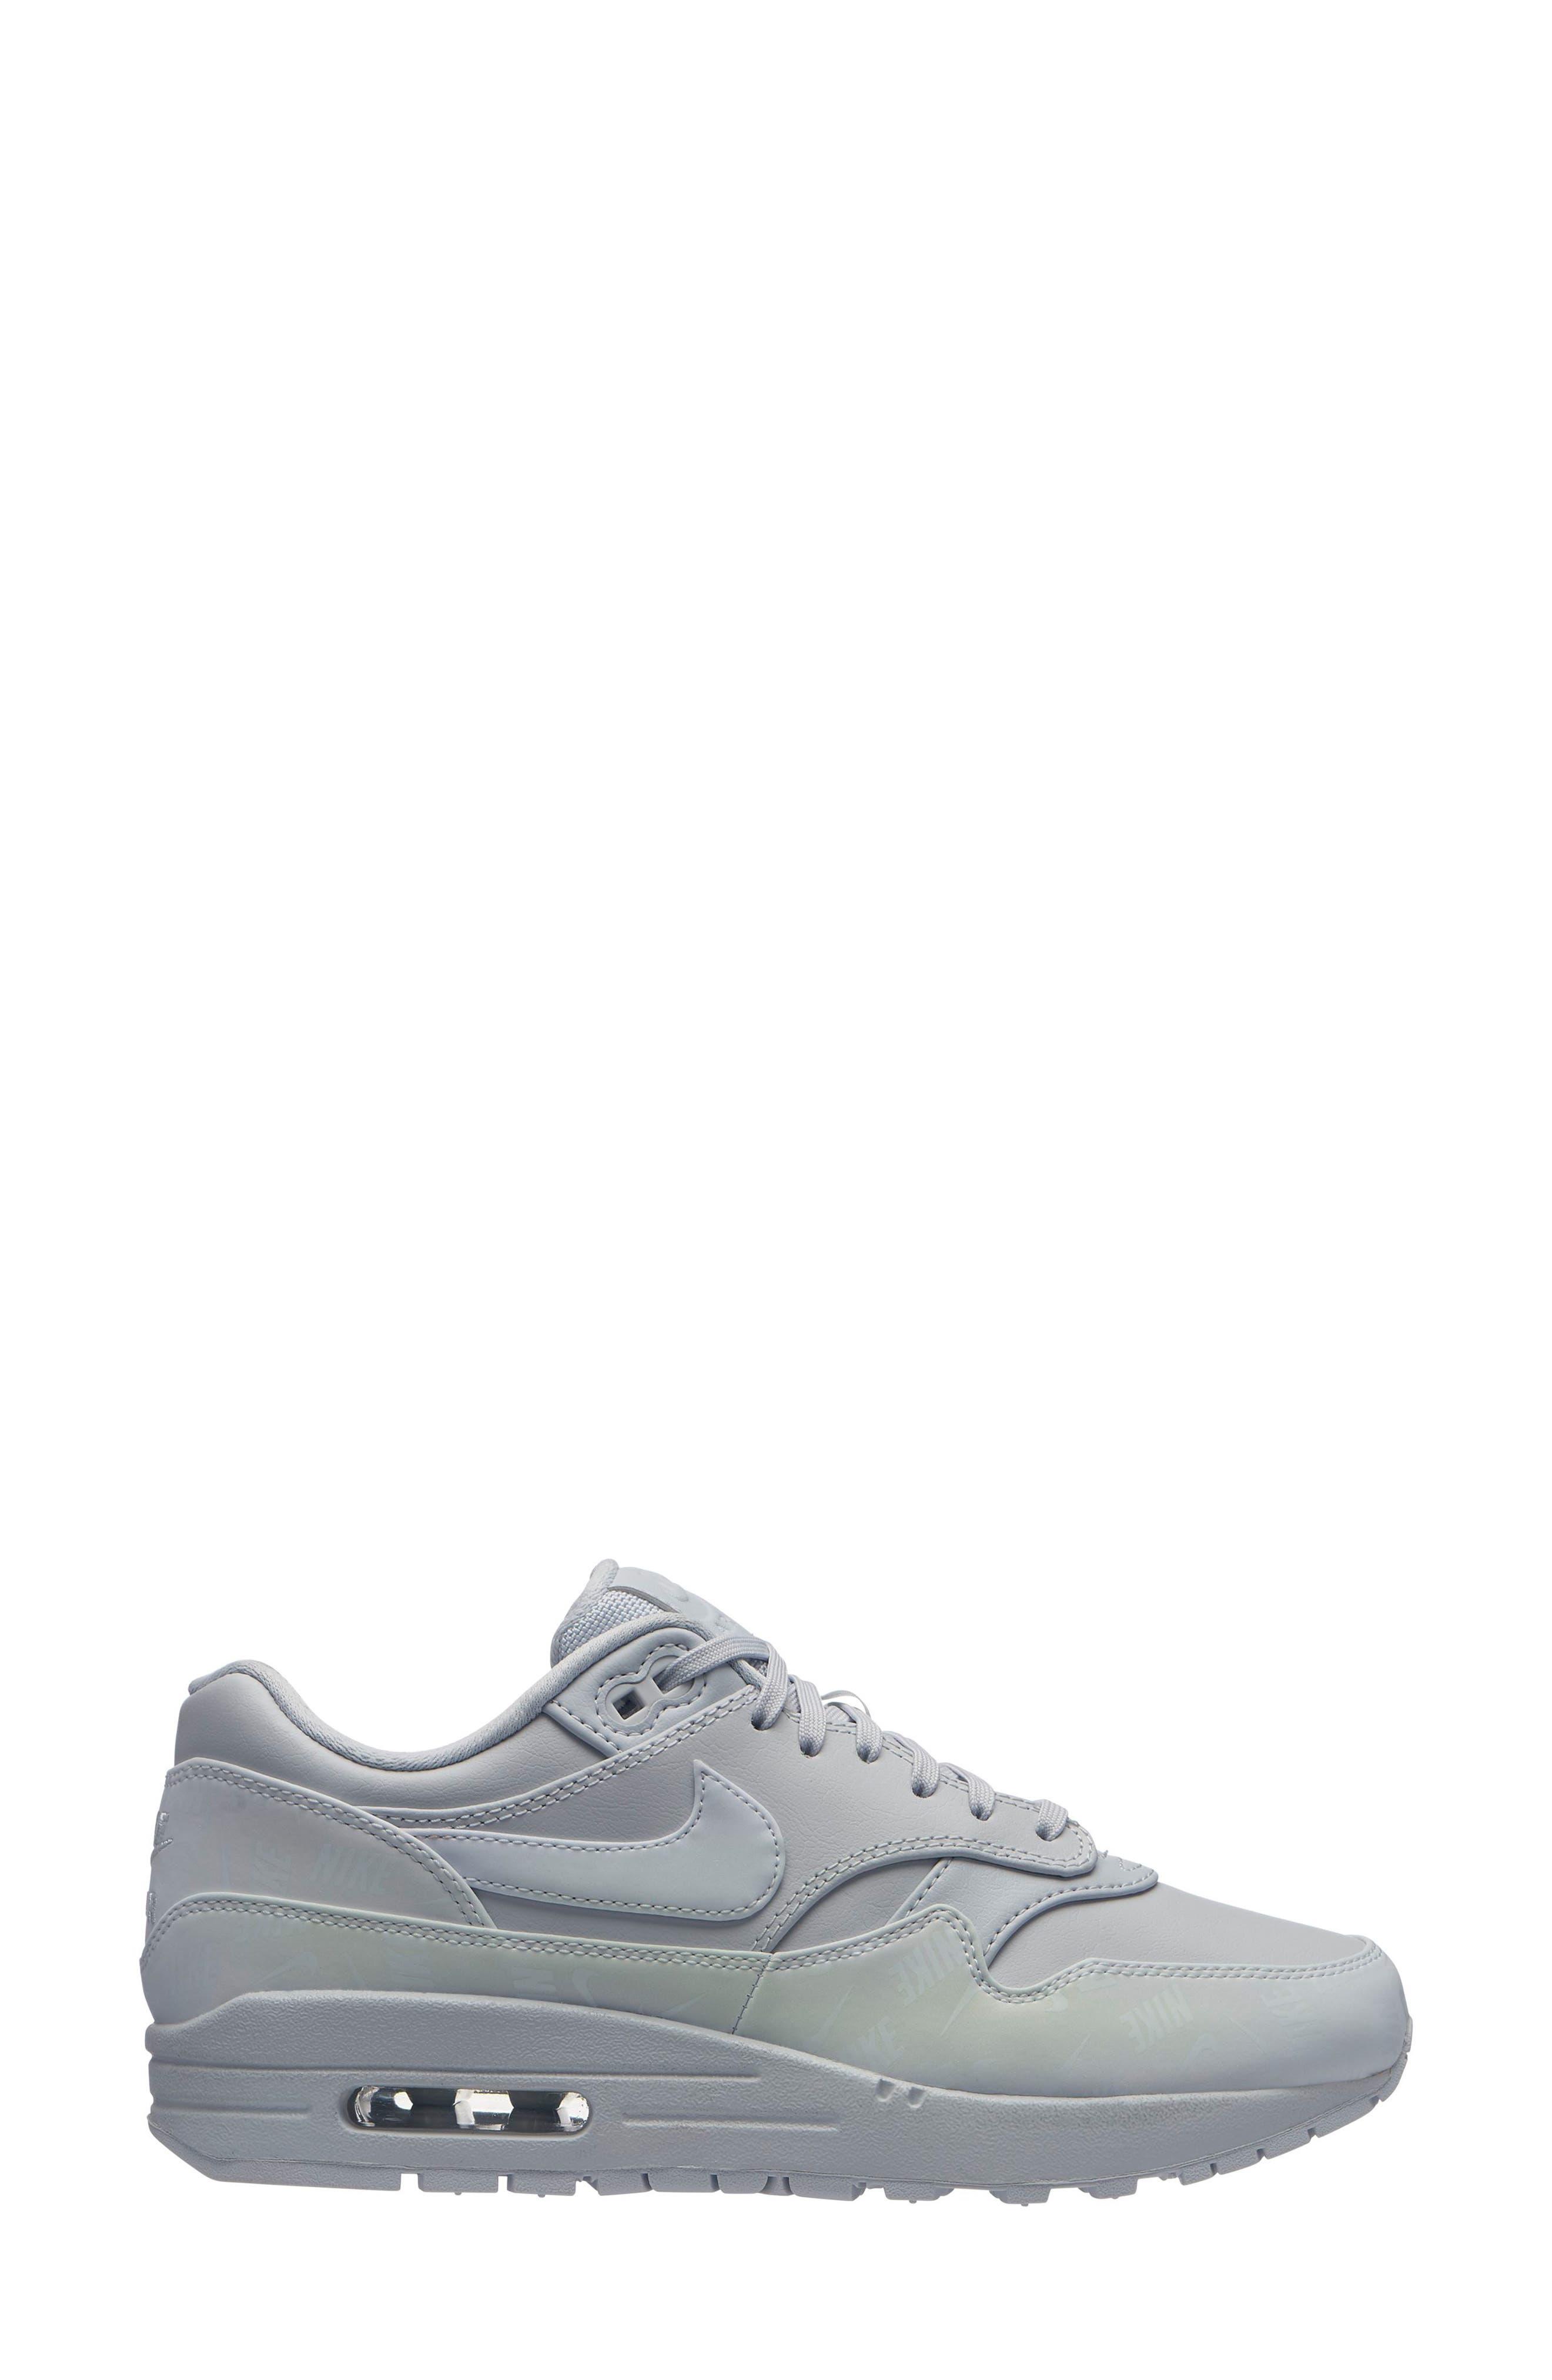 NIKE, Air Max 1 Lux Sneaker, Main thumbnail 1, color, PURE PLATINUM/ PURE PLATINUM